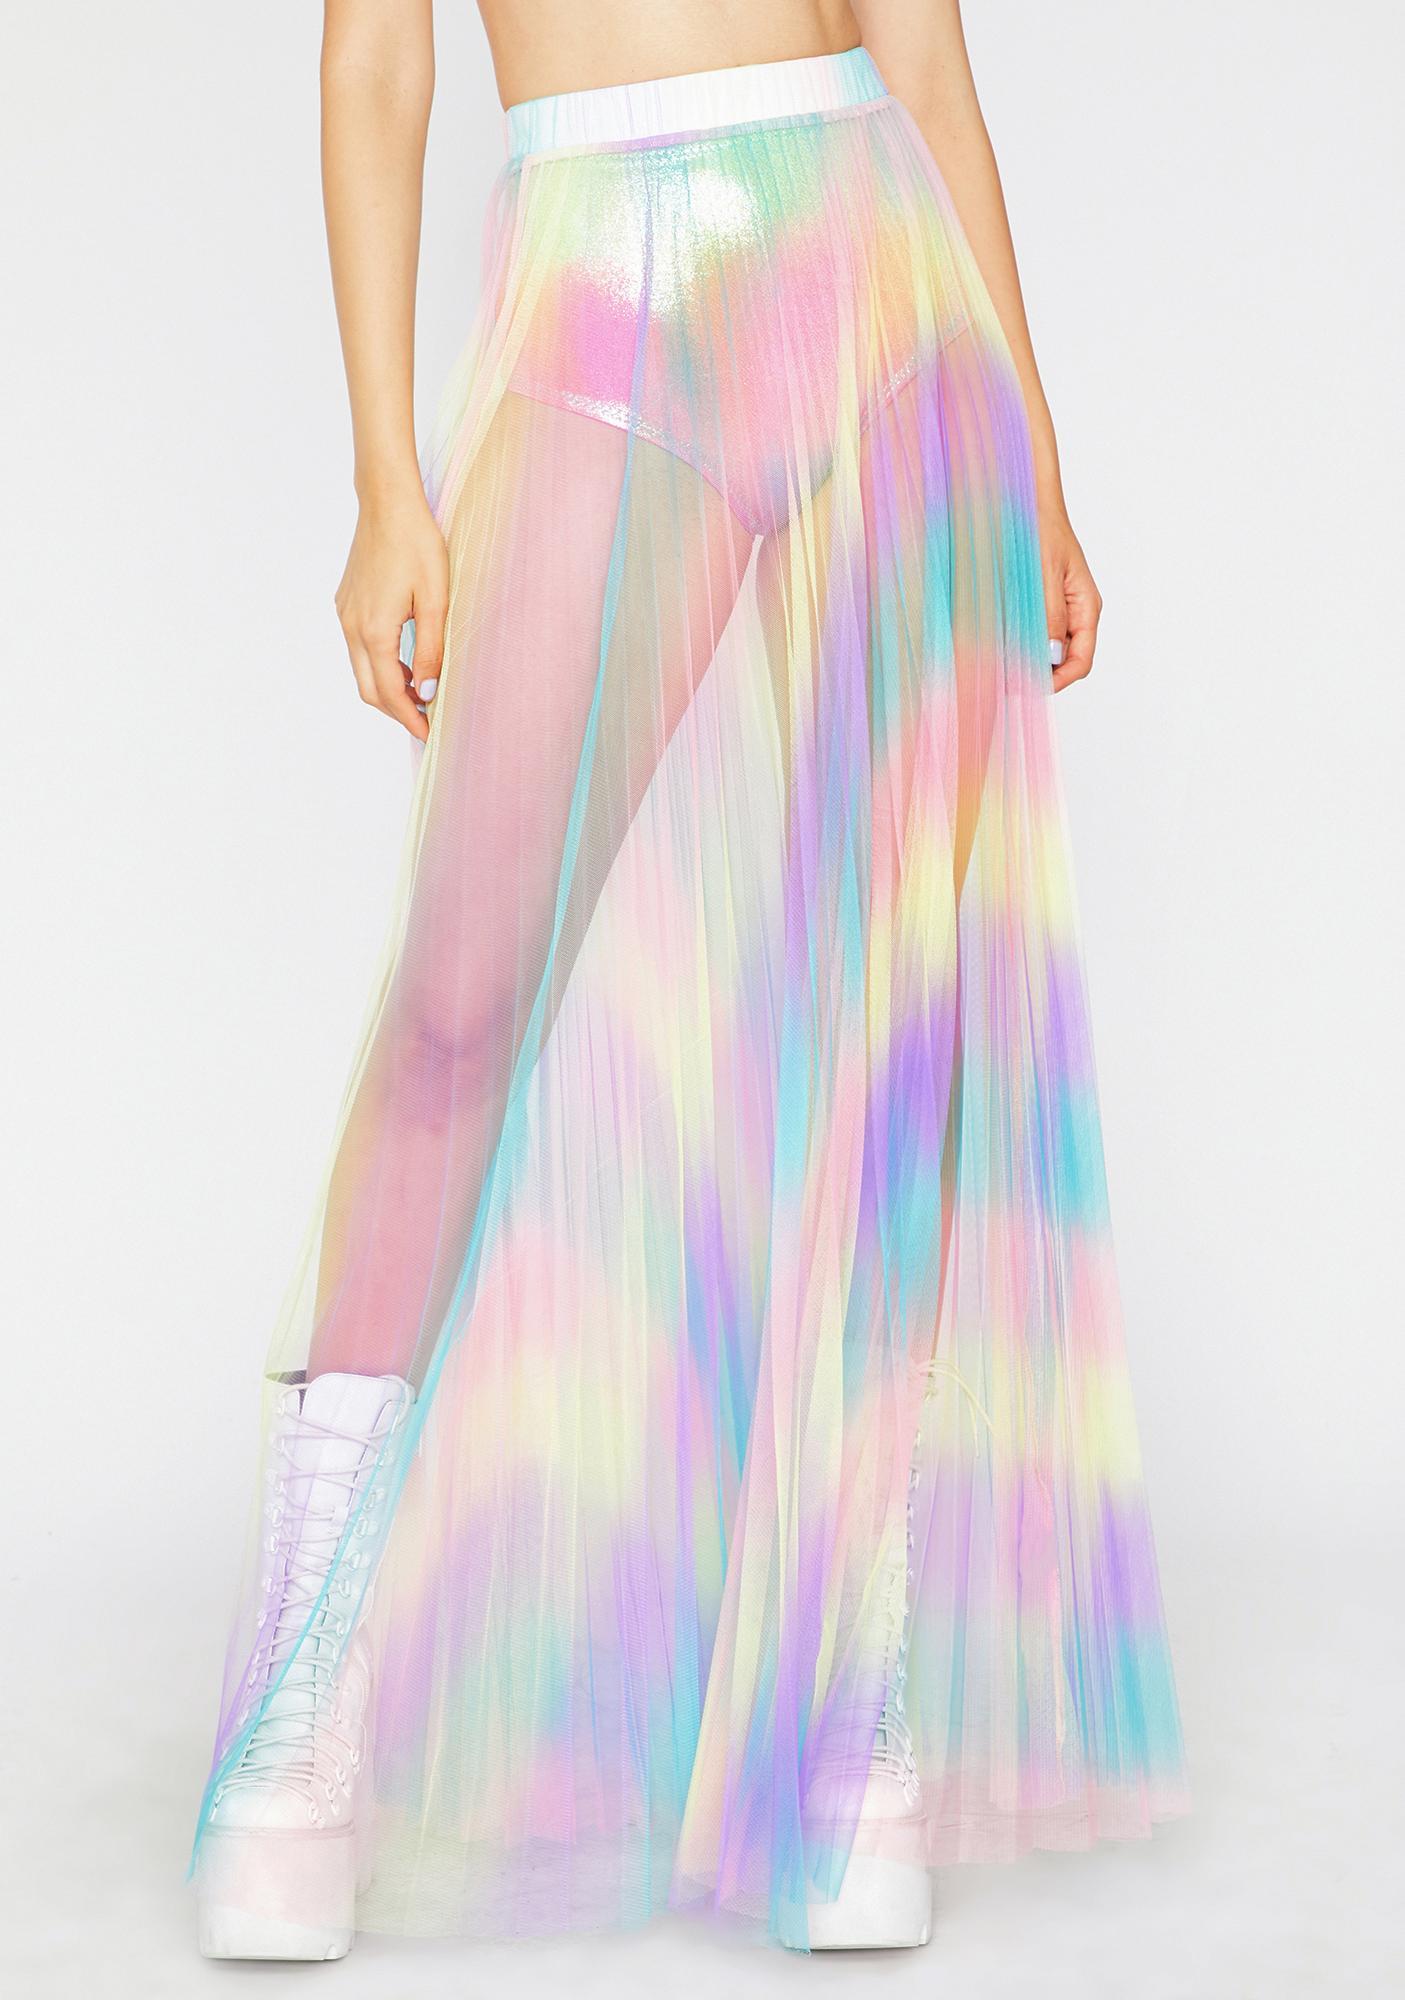 Sunset Seduction Maxi Skirt